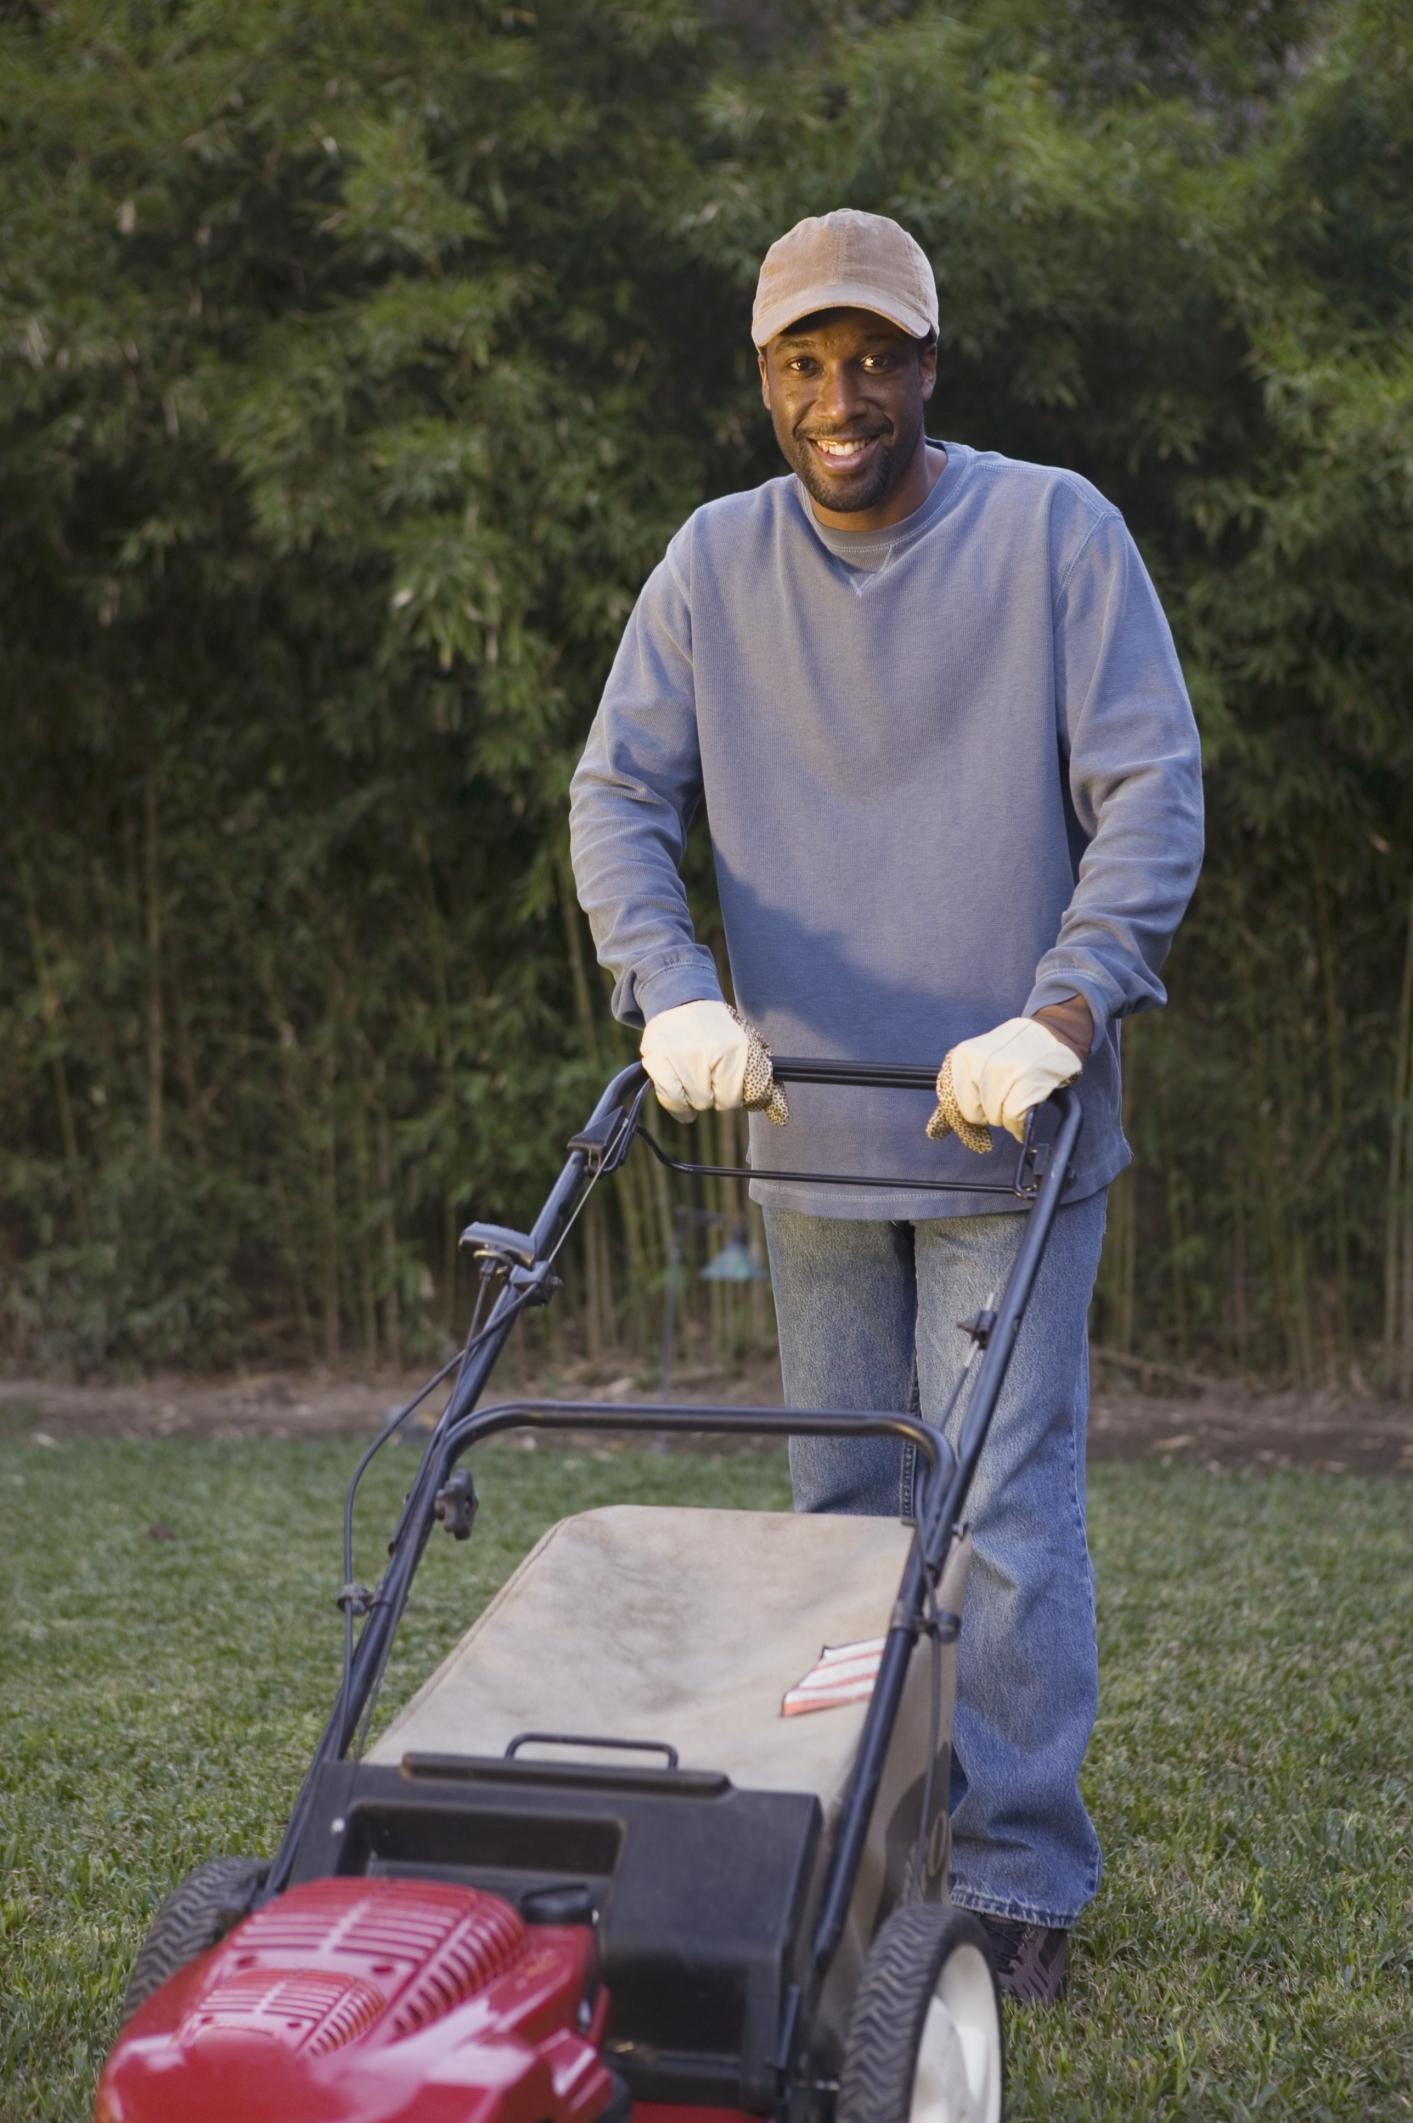 Troy-Bilt Lawn Mower Repair | Garden Guides